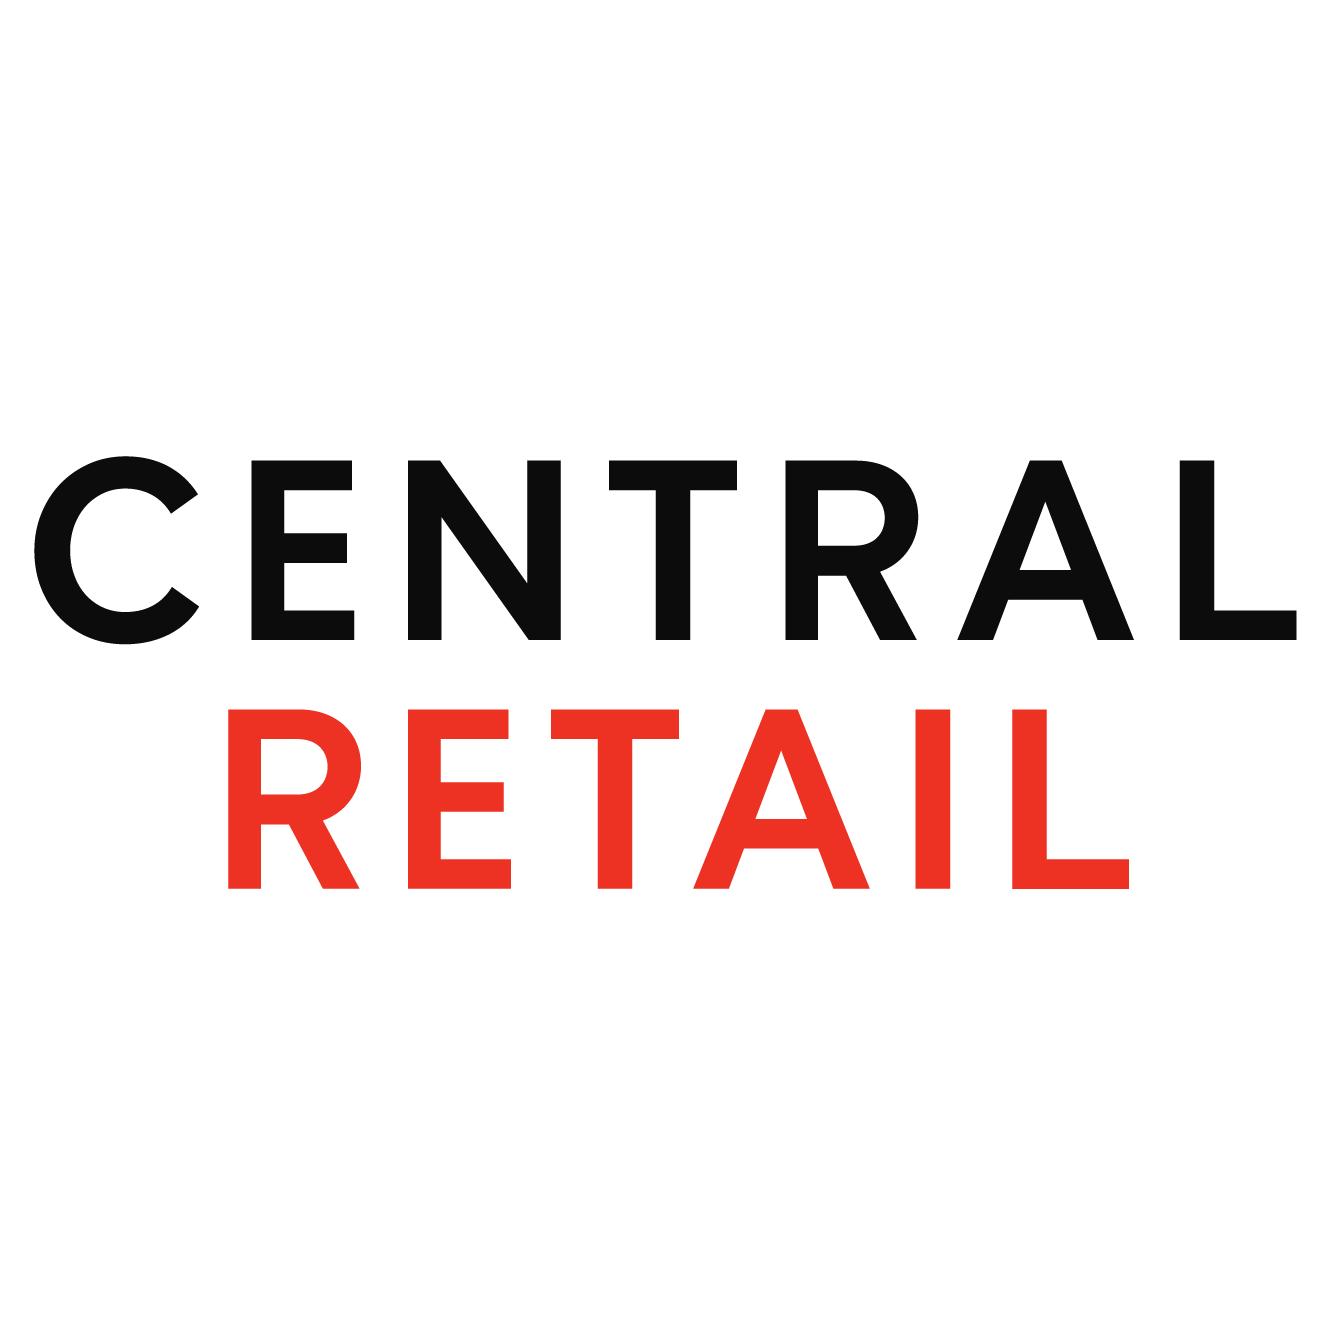 Central Centralretail Retail หางาน สมัครงาน เซ็นทรัลรีเทล เซ็นทรัล งาน